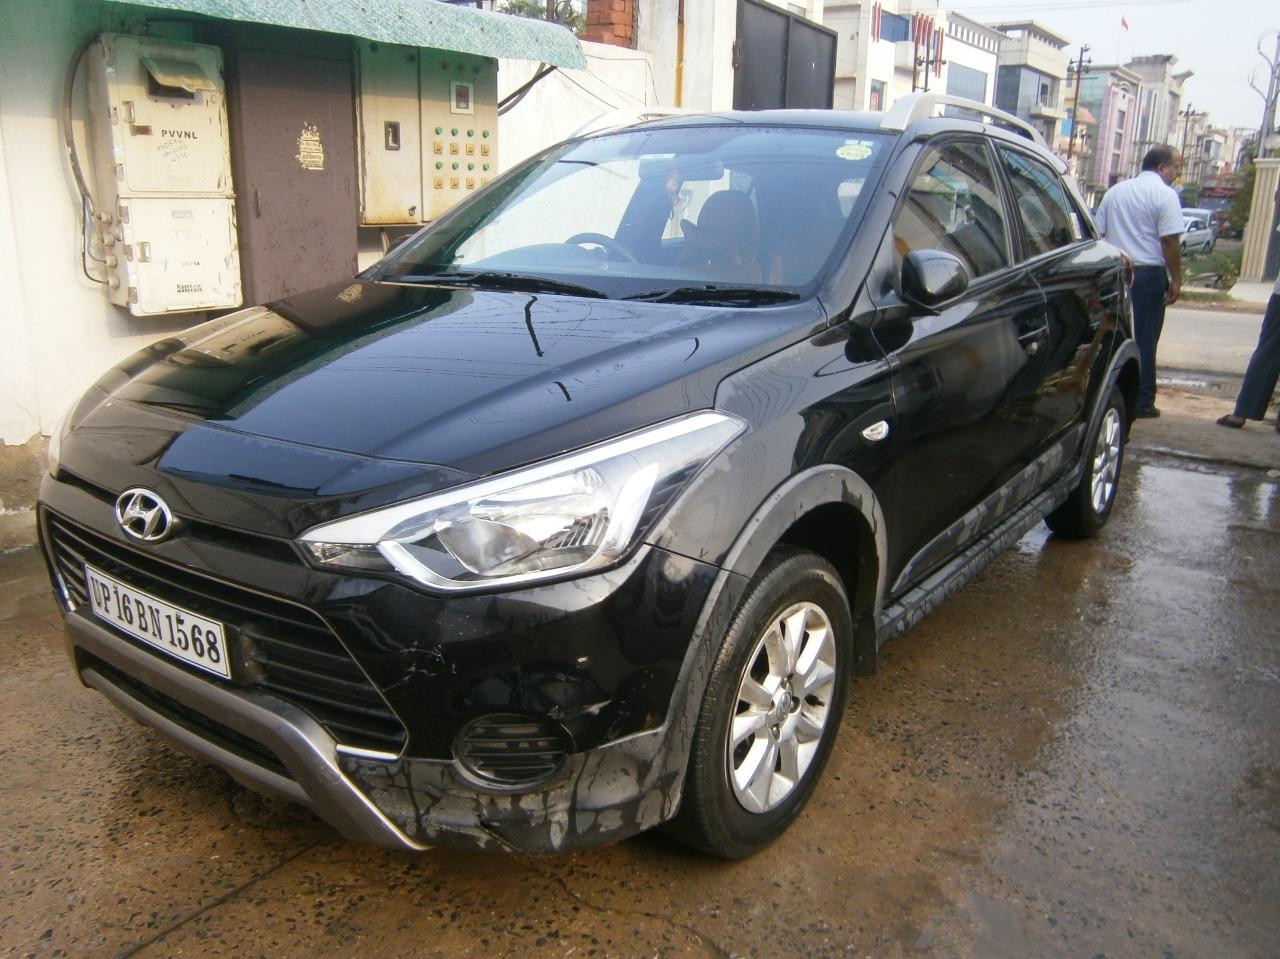 2017 Used Hyundai I20 Active 1.2